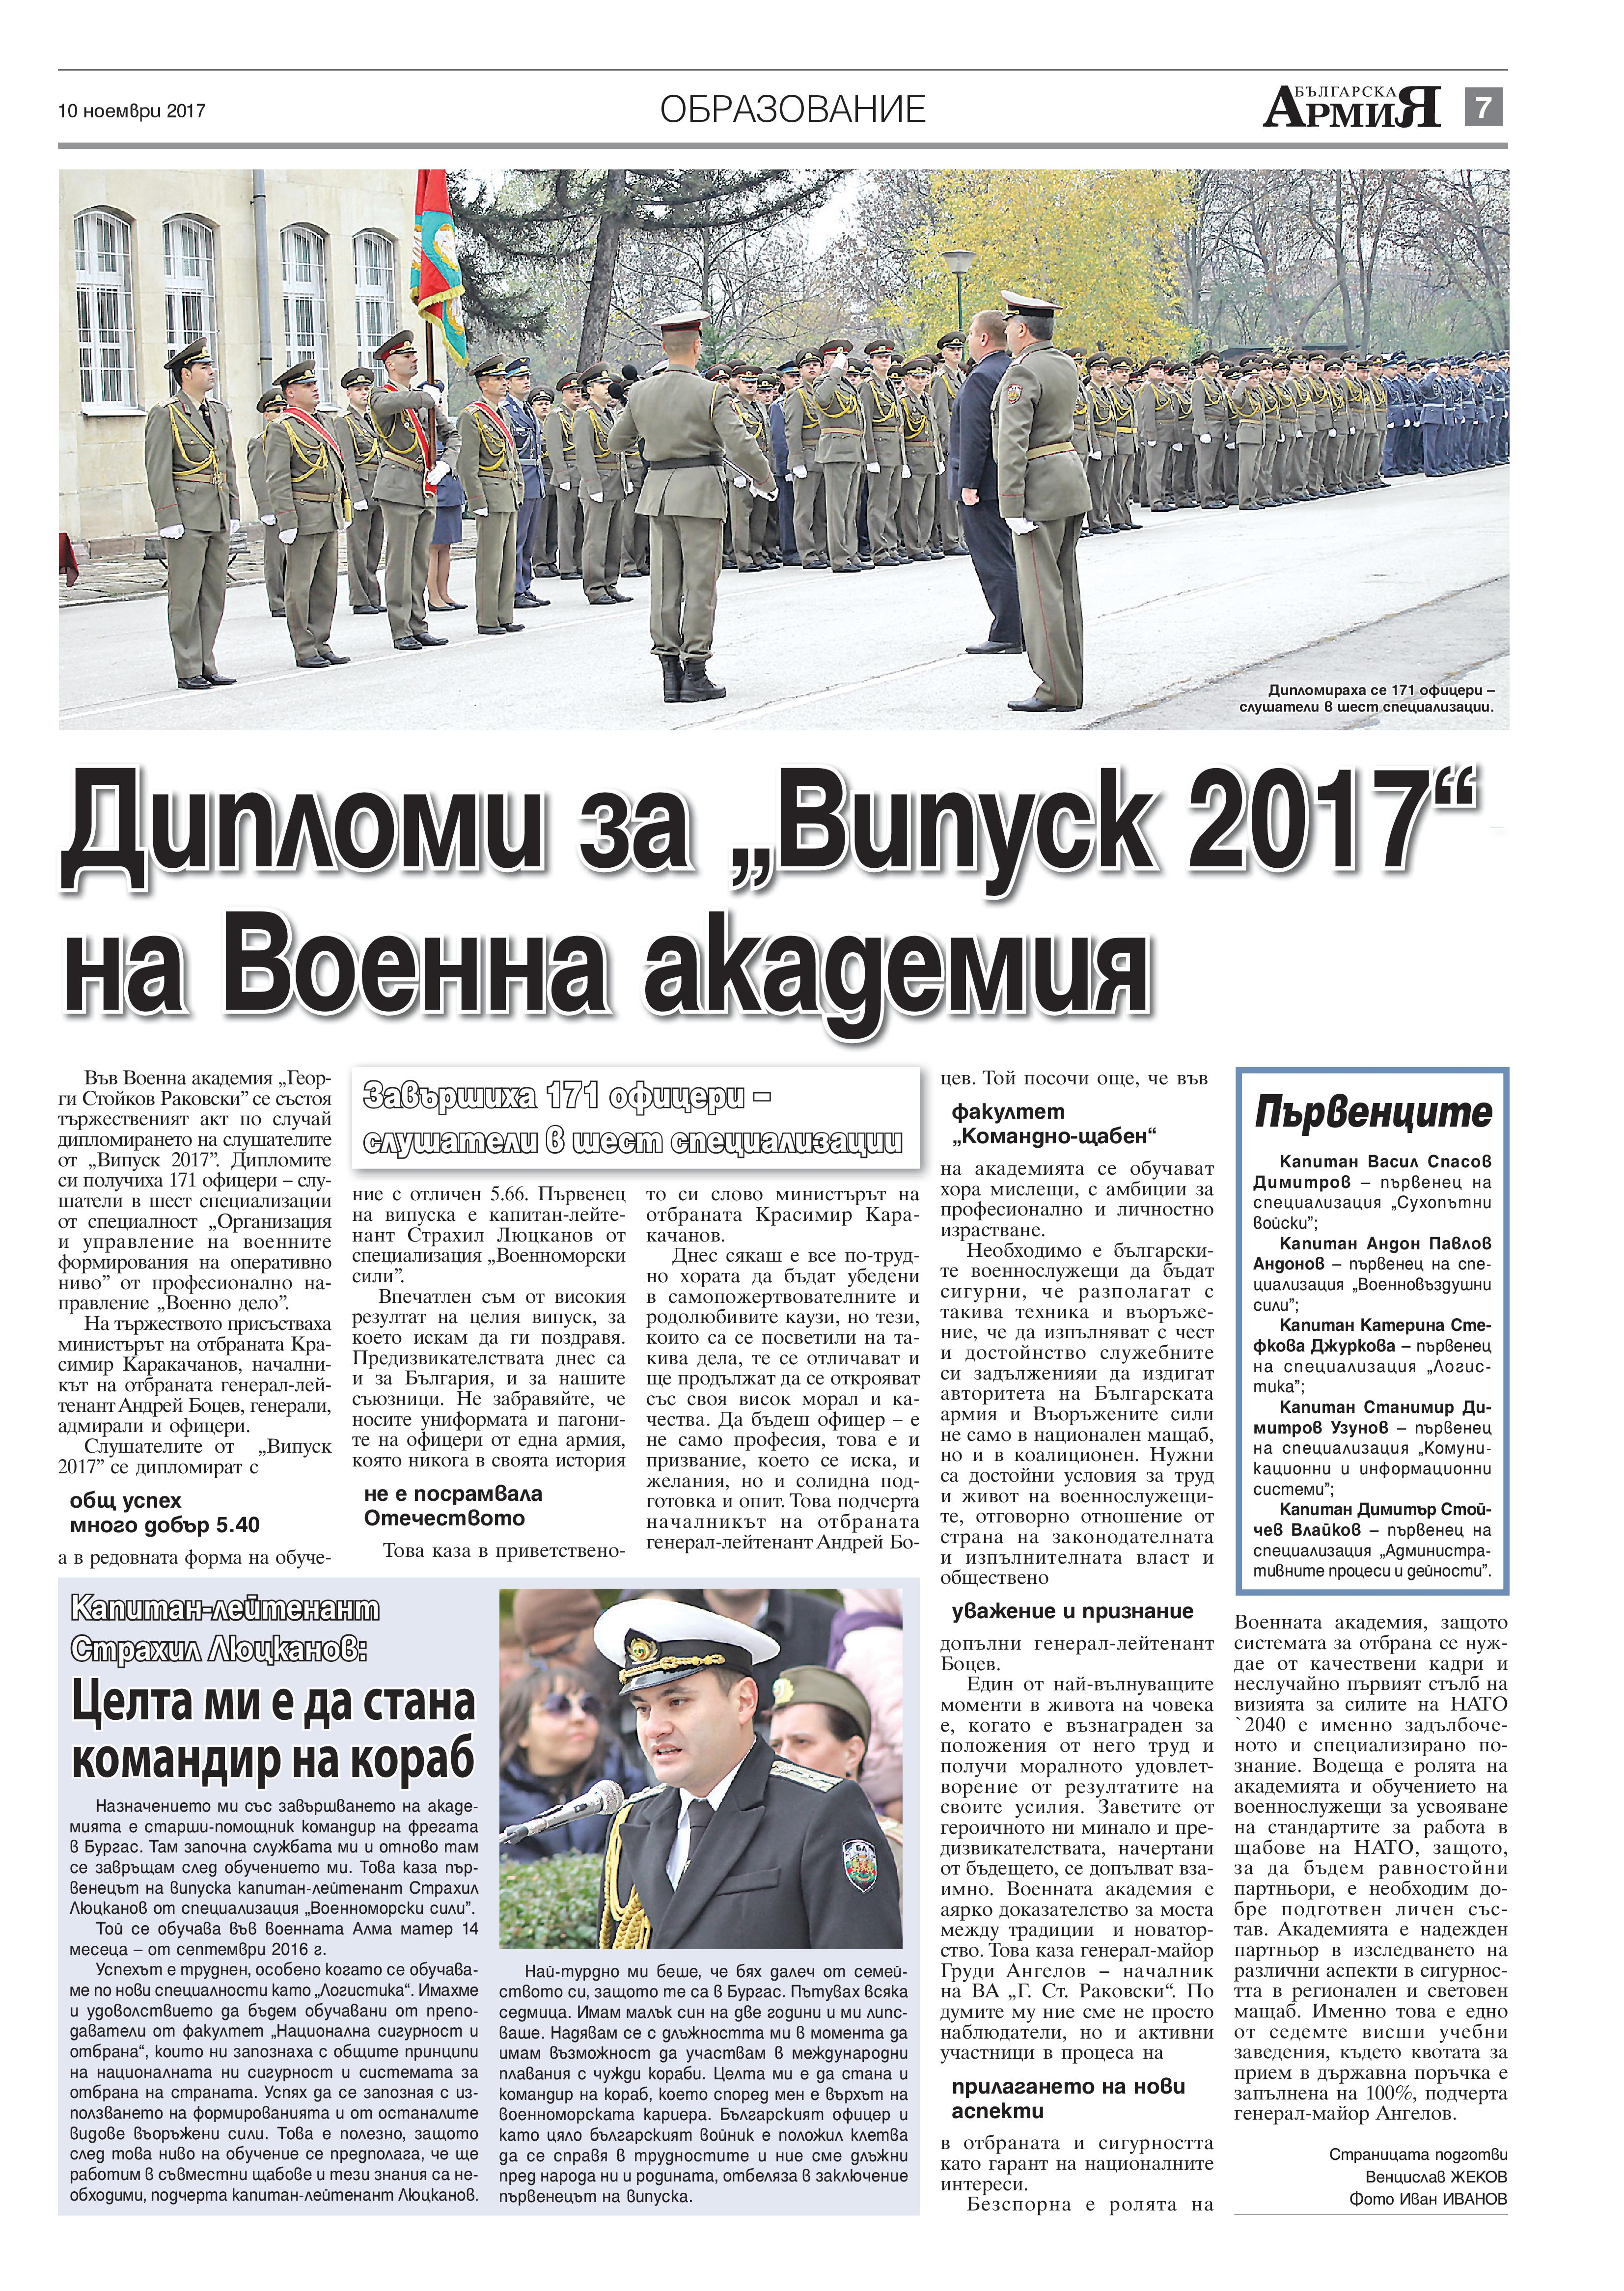 http://armymedia.bg/wp-content/uploads/2015/06/07-10.jpg